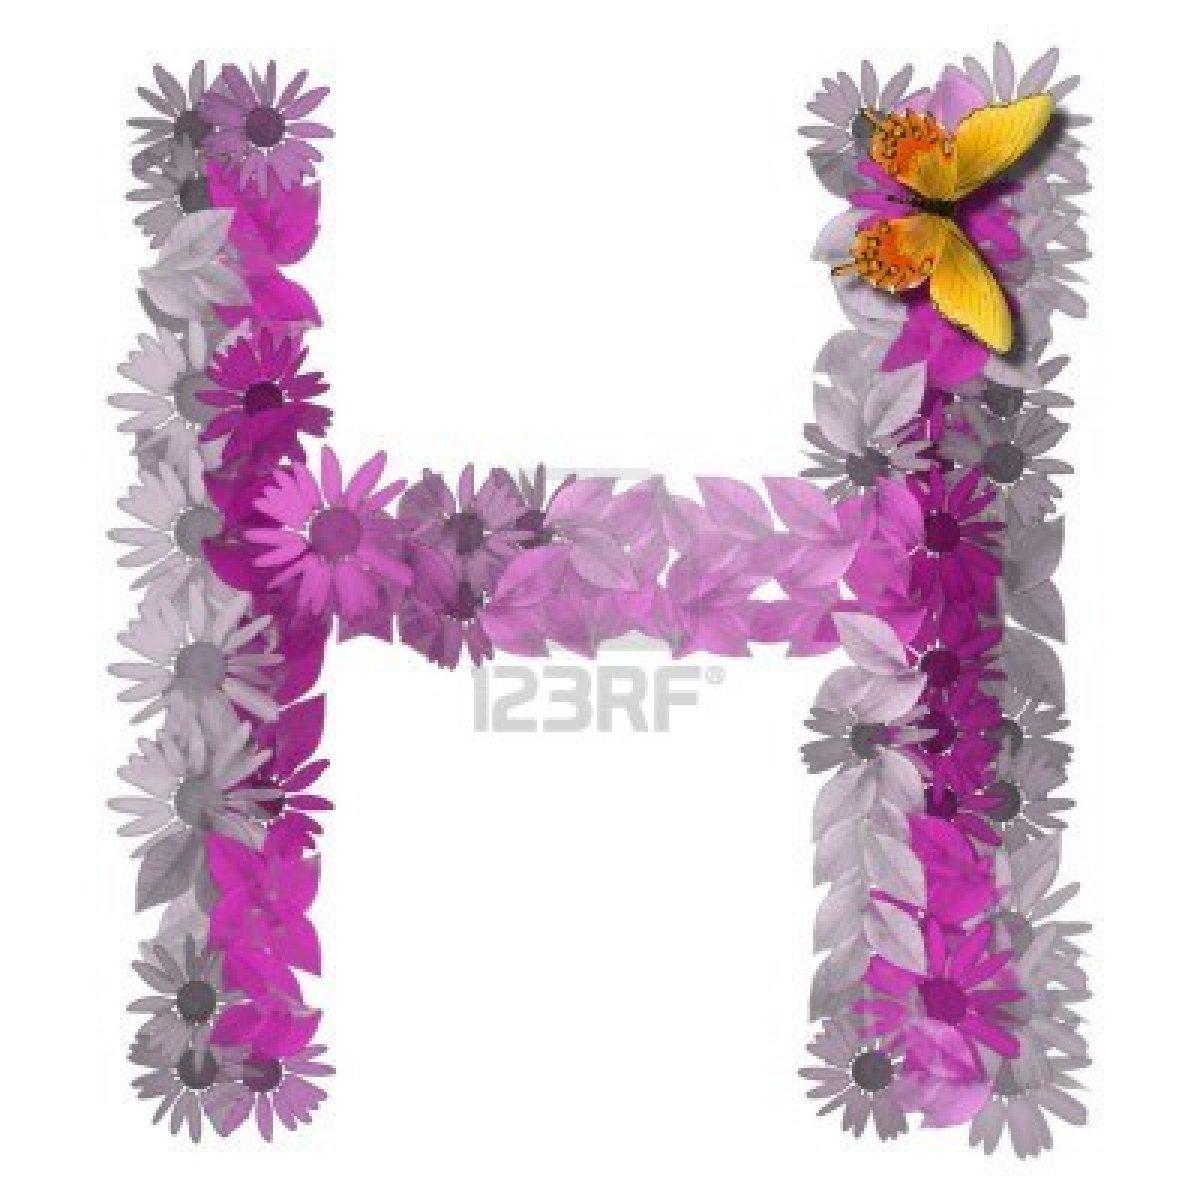 dessin en couleurs imprimer chiffres et formes alphabet lettre h num ro 76888. Black Bedroom Furniture Sets. Home Design Ideas